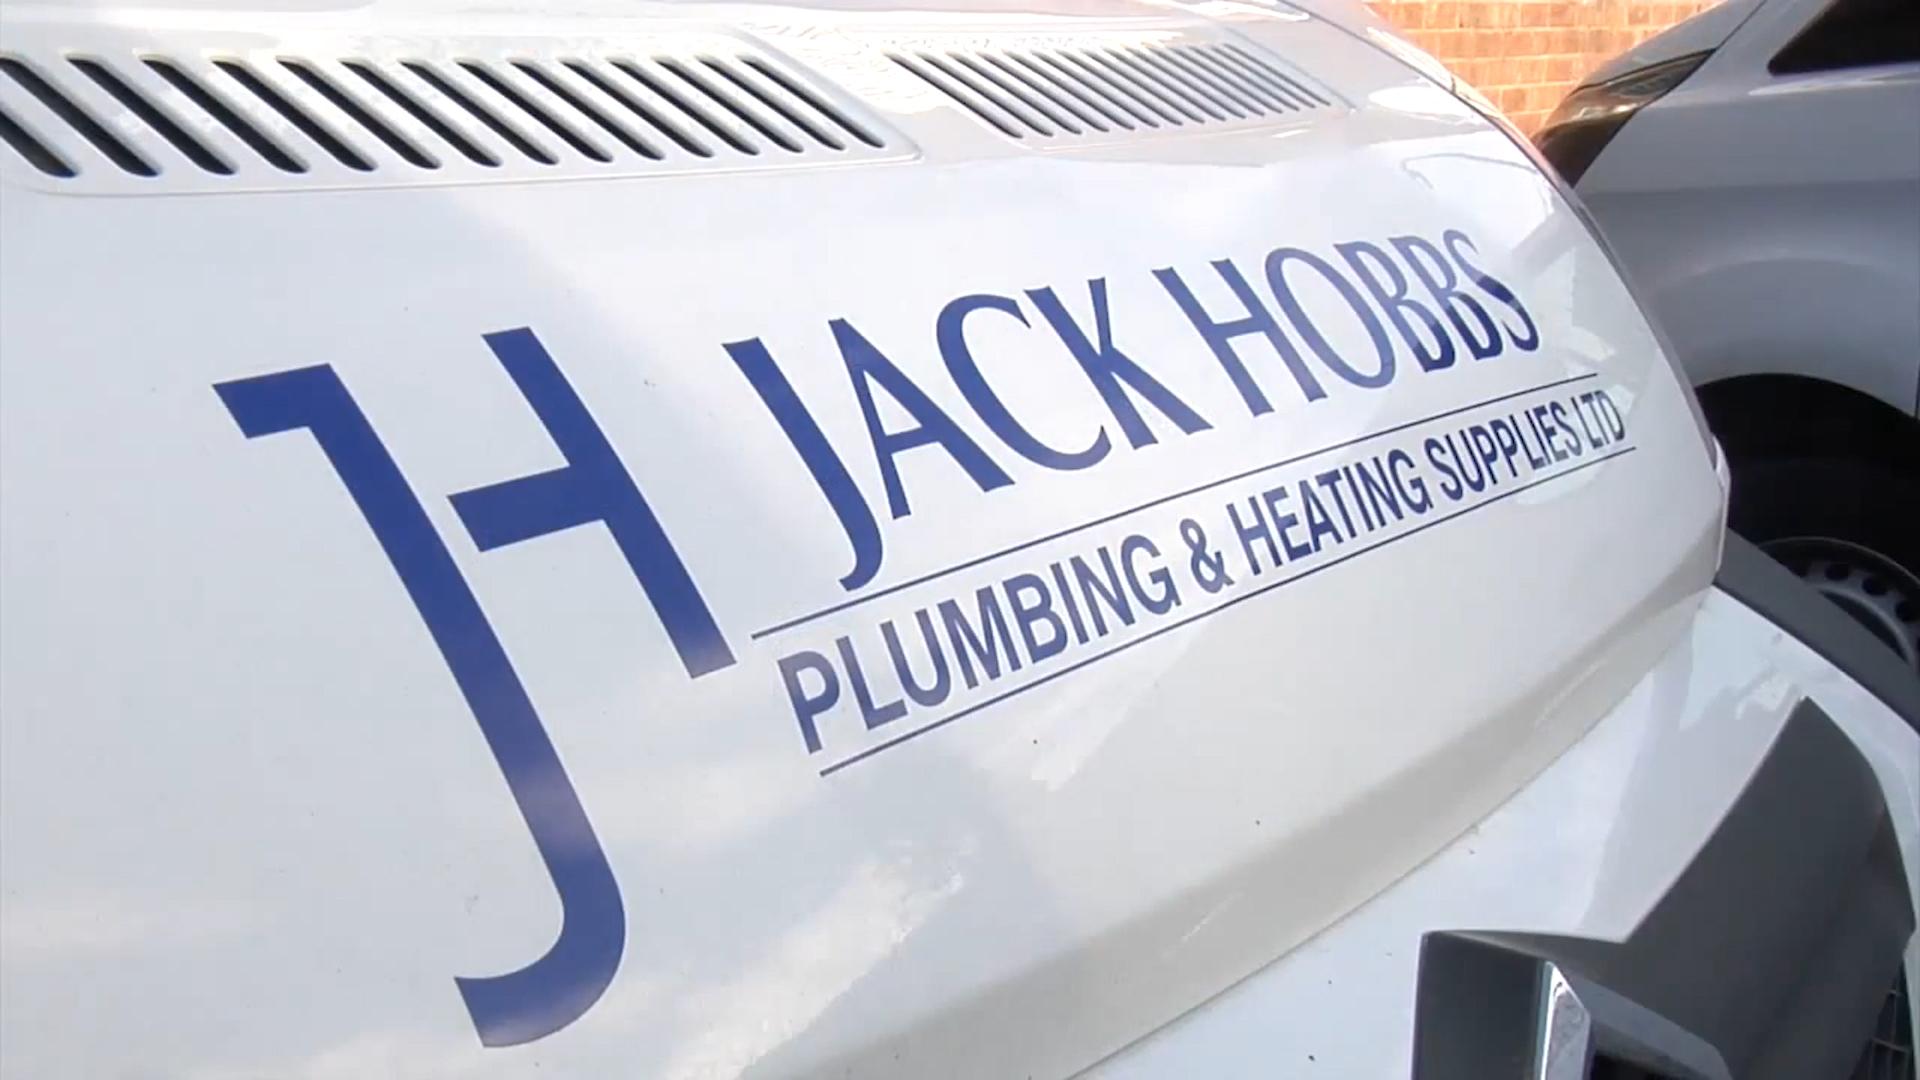 Jack Hobbs Plumbing